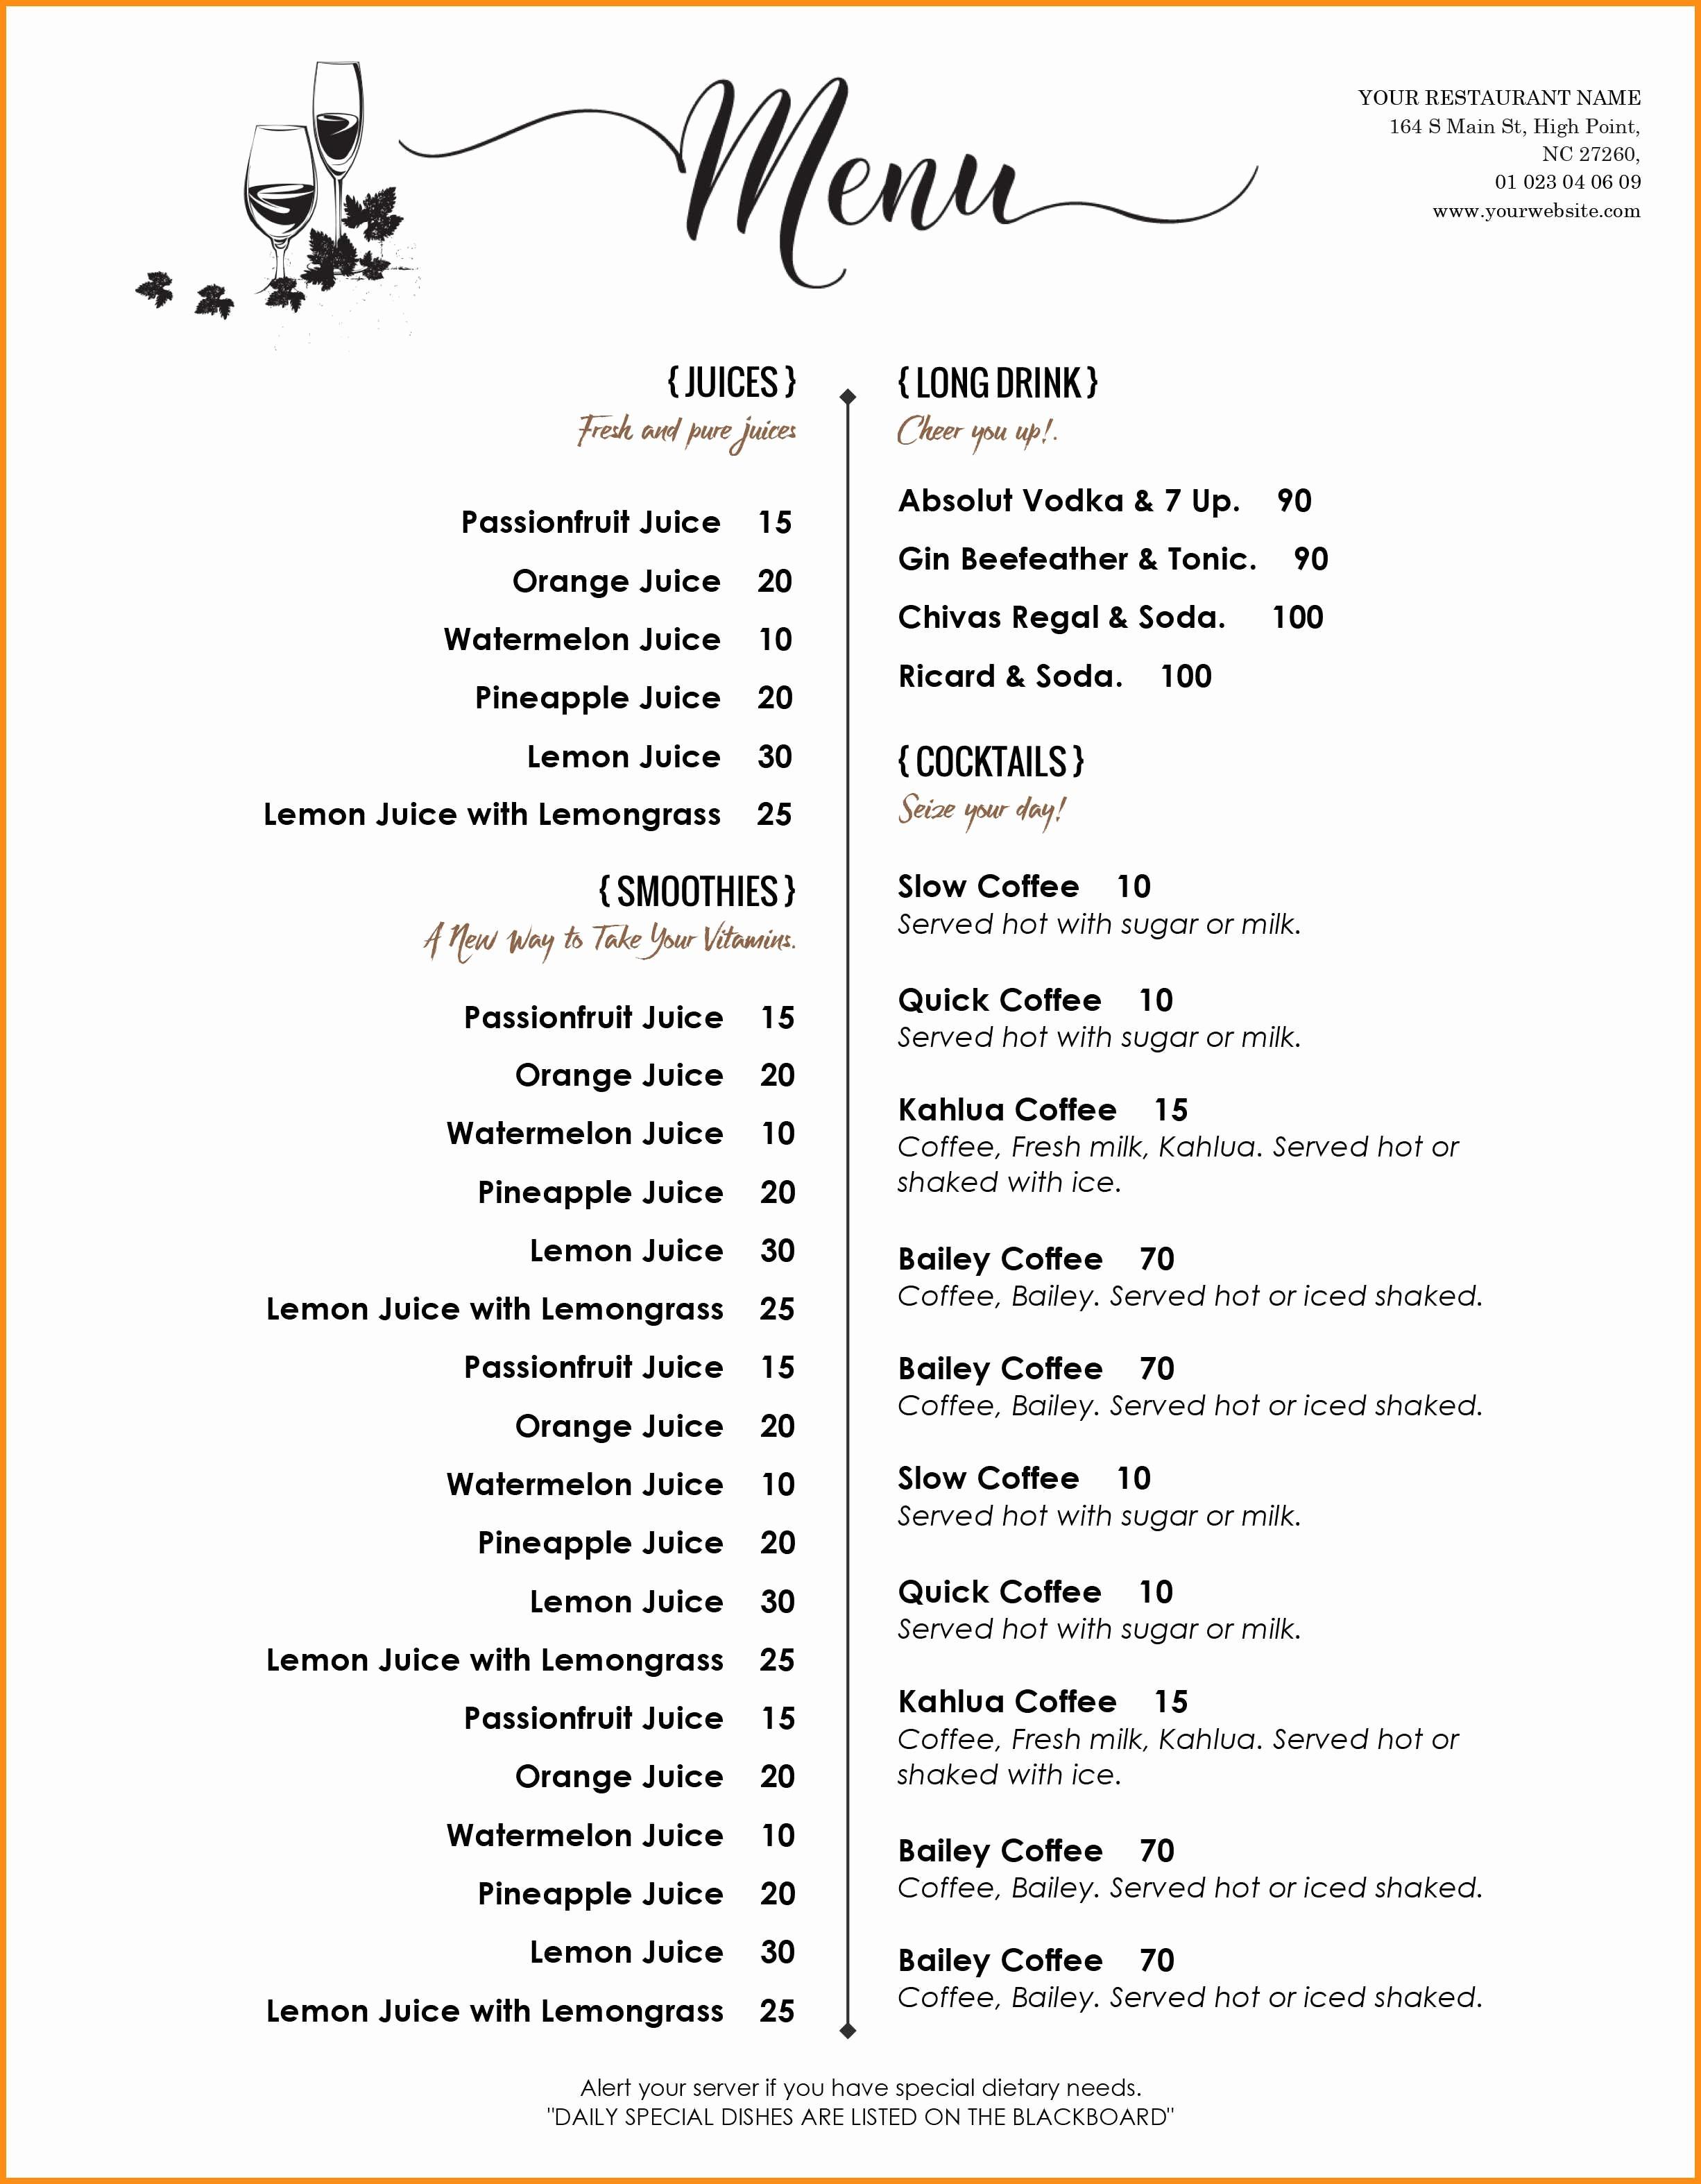 Free Printable Drink Menu Template Elegant 8 Free Menu Templates Word